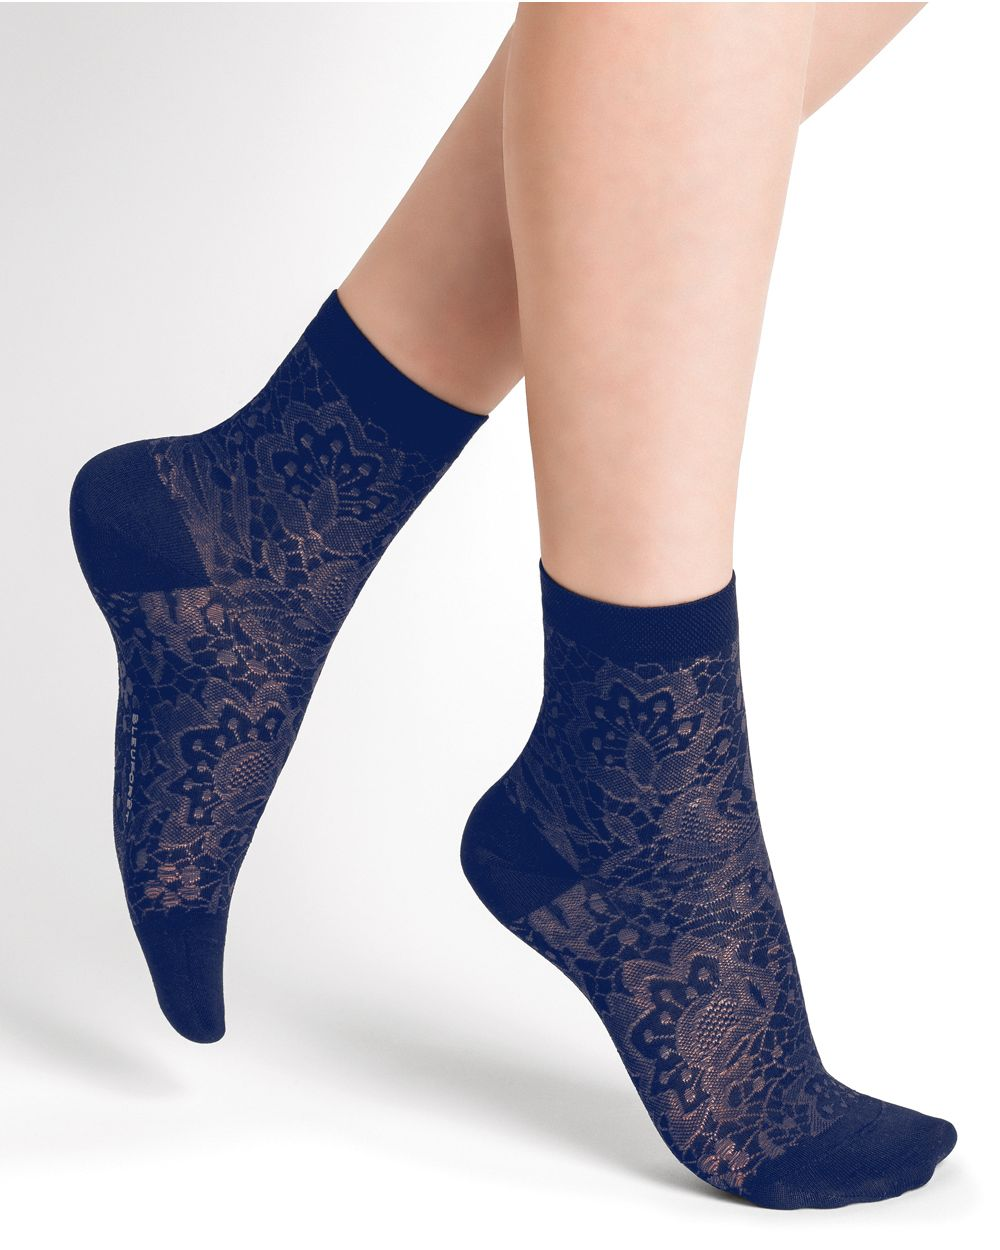 Floral pattern silk ankle socks